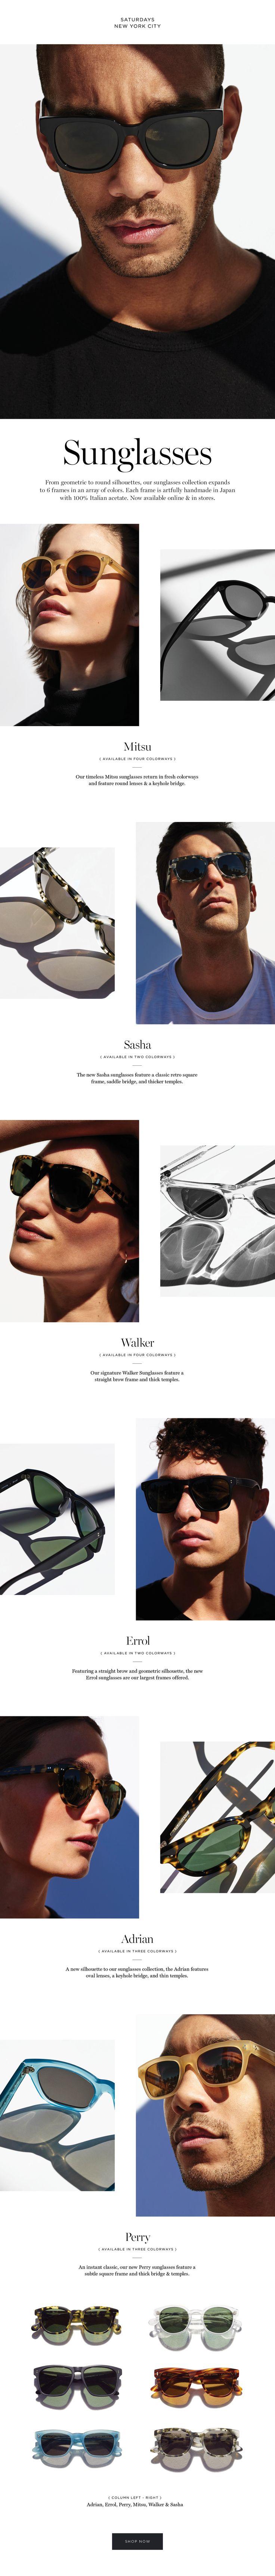 Saturdays NYC New Sunglasses Collection. #saturdaysnyc #sunglasses #japanese